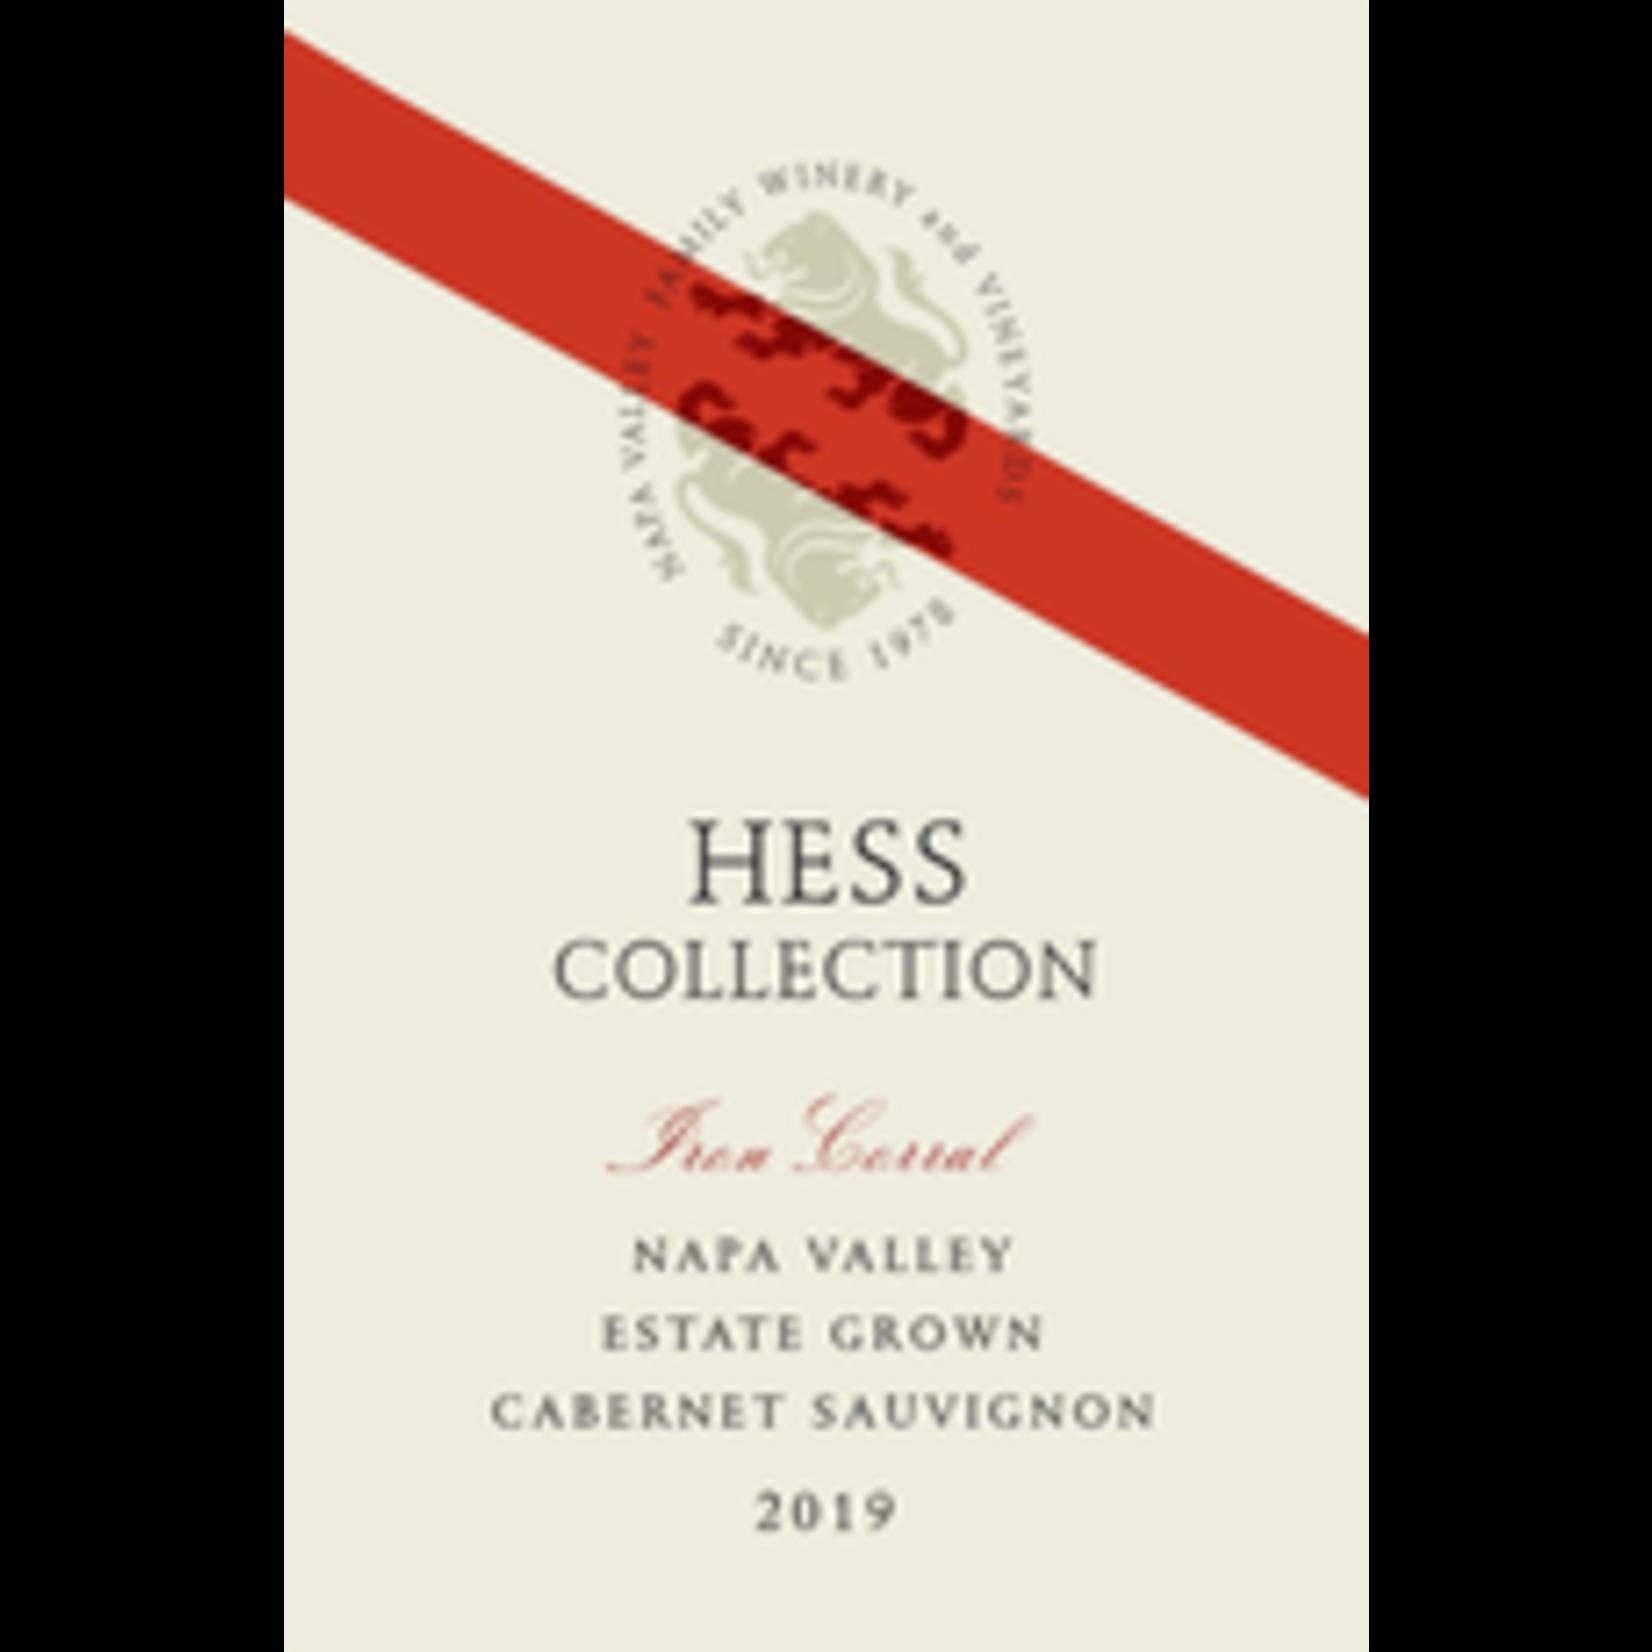 Wine Hess Collection Napa Valley Estate Grown Cabernet Sauvignon Iron Corral 2918